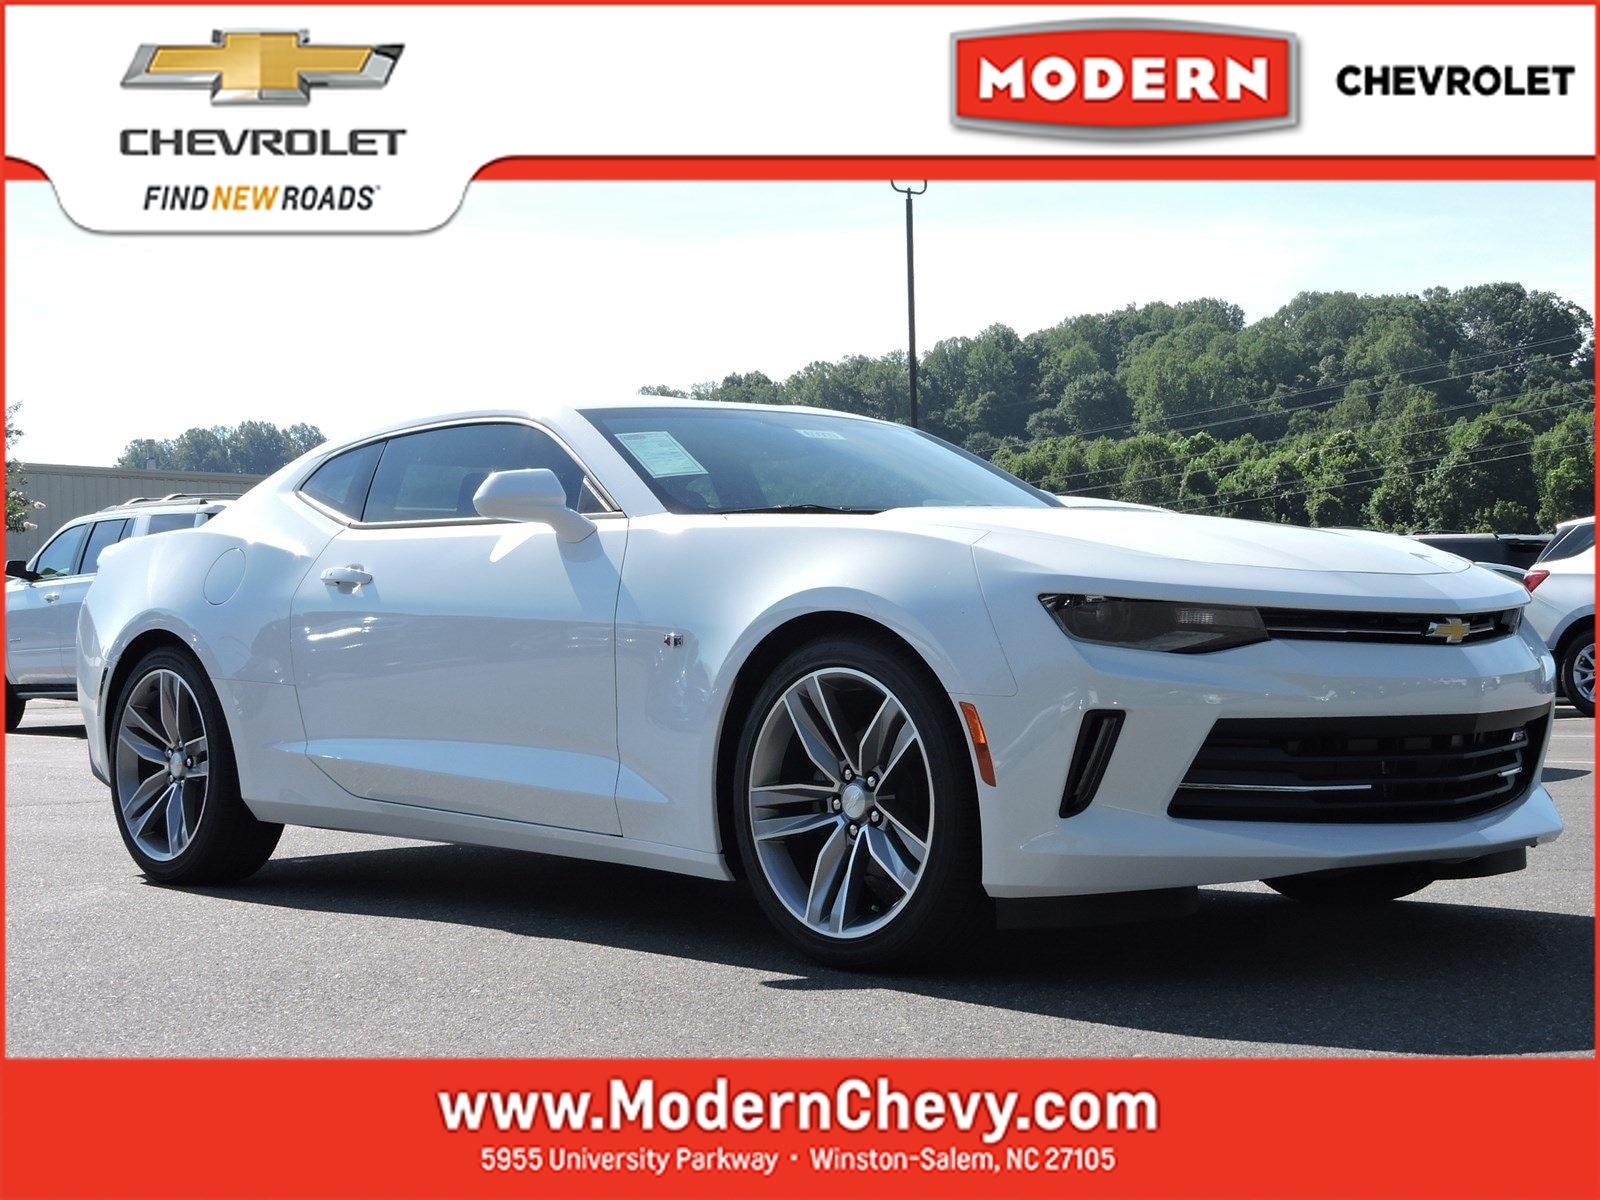 Modern Chevrolet | Vehicles for sale in Winston Salem, NC 27105